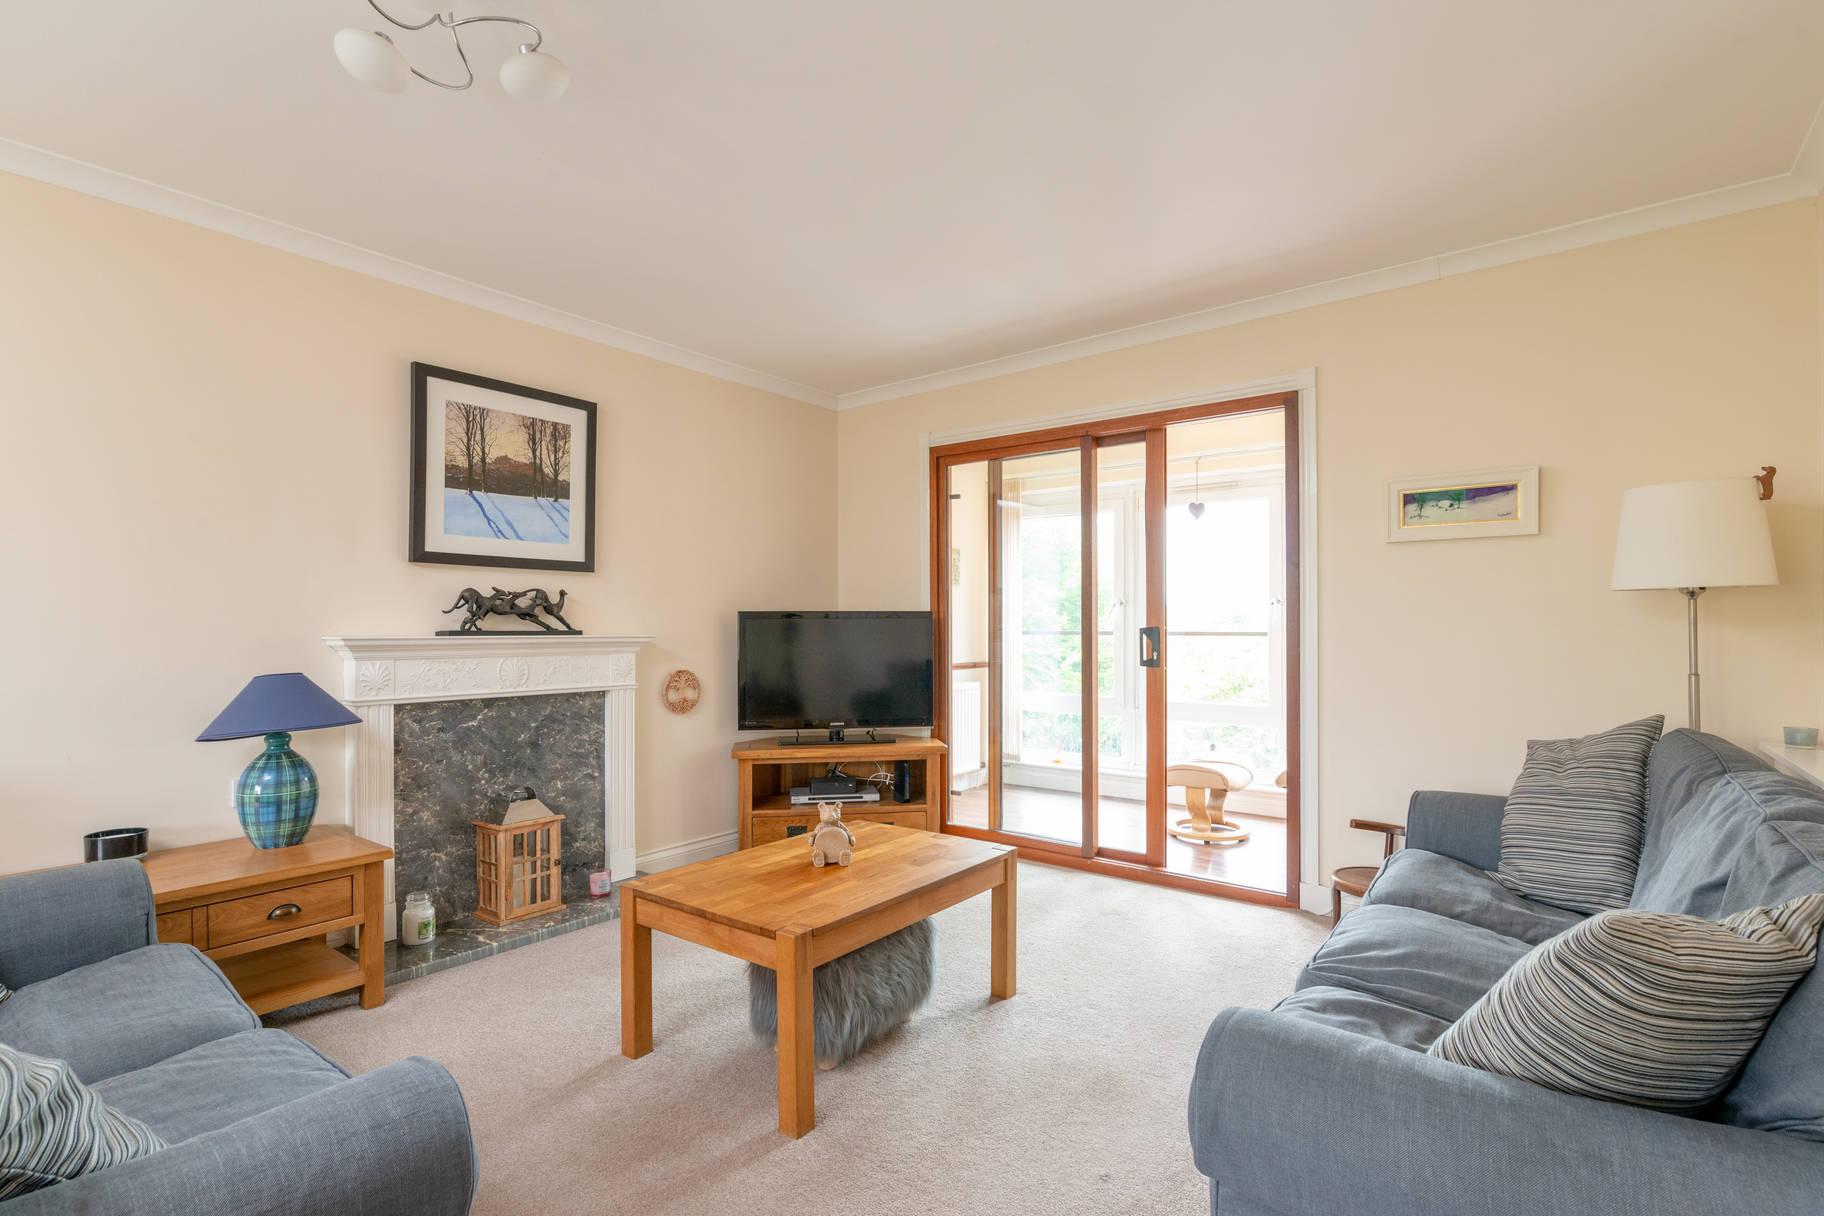 186/4 Moray Lodge, Granton Road